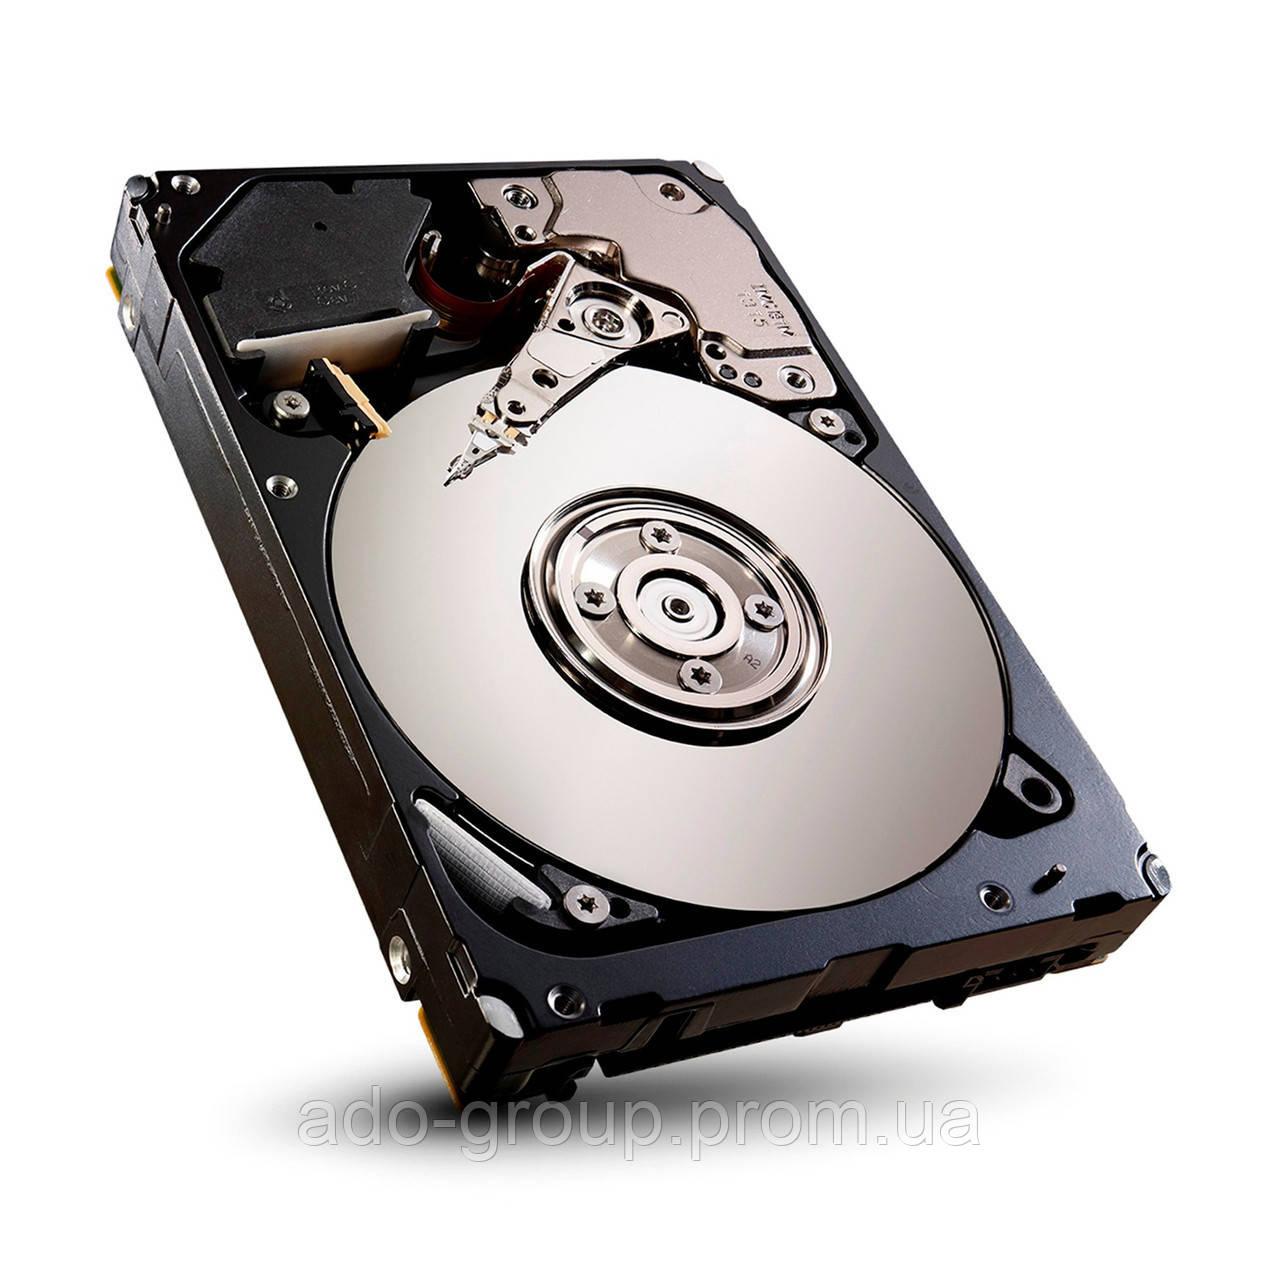 "400-AJPD Жесткий диск Dell 1200GB SAS 10K  2.5"" +"